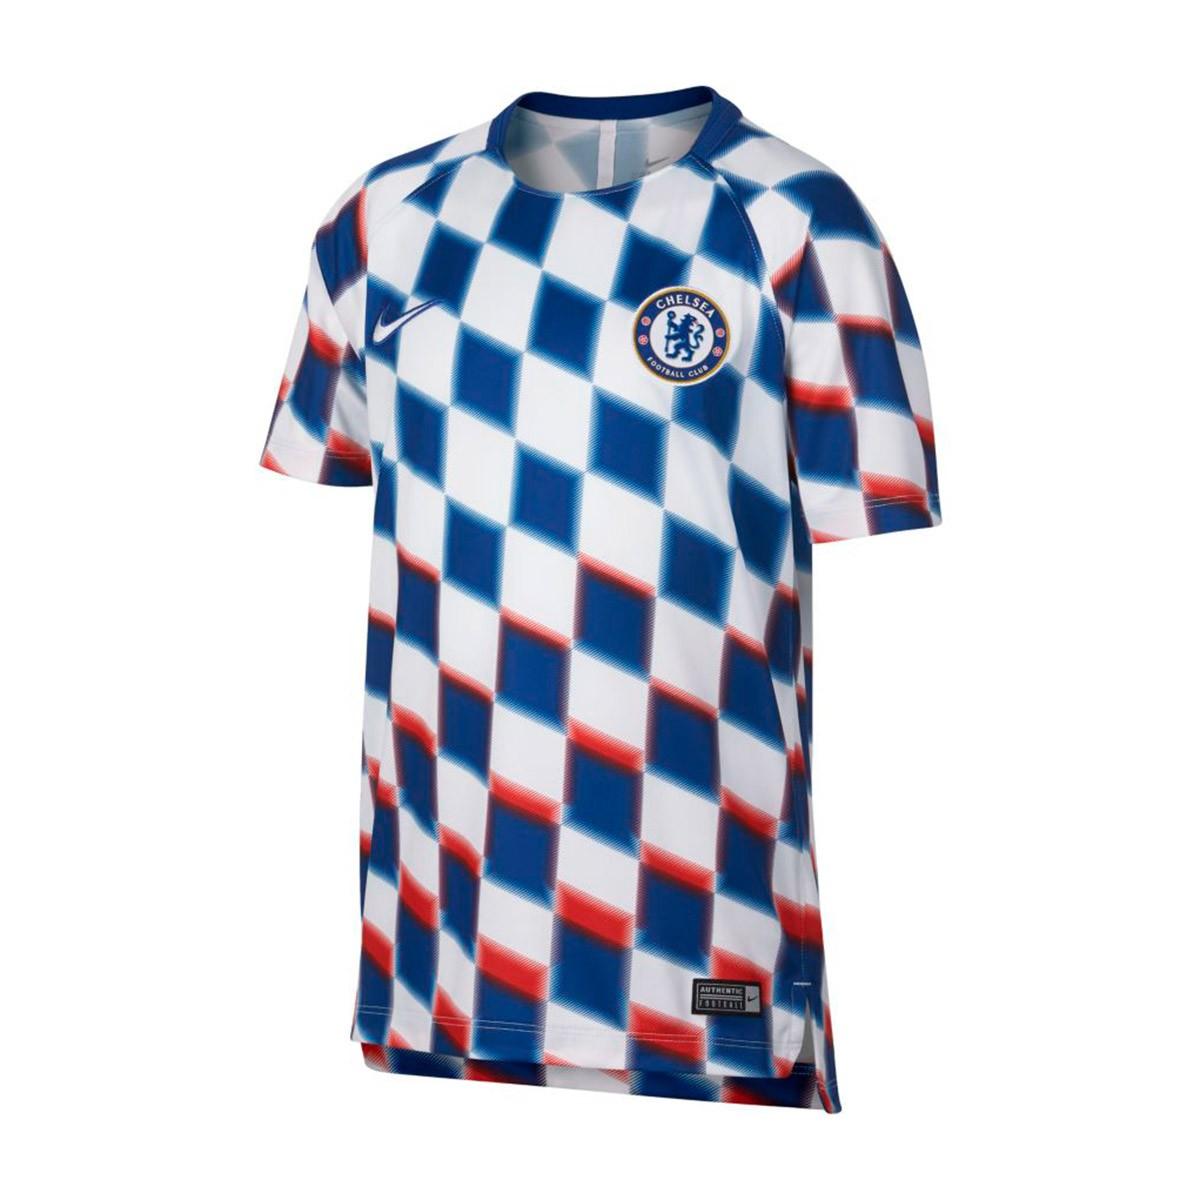 premium selection 006c0 397a1 Camiseta Chelsea FC Squad 2018-2019 Niño White-Rush blue-White